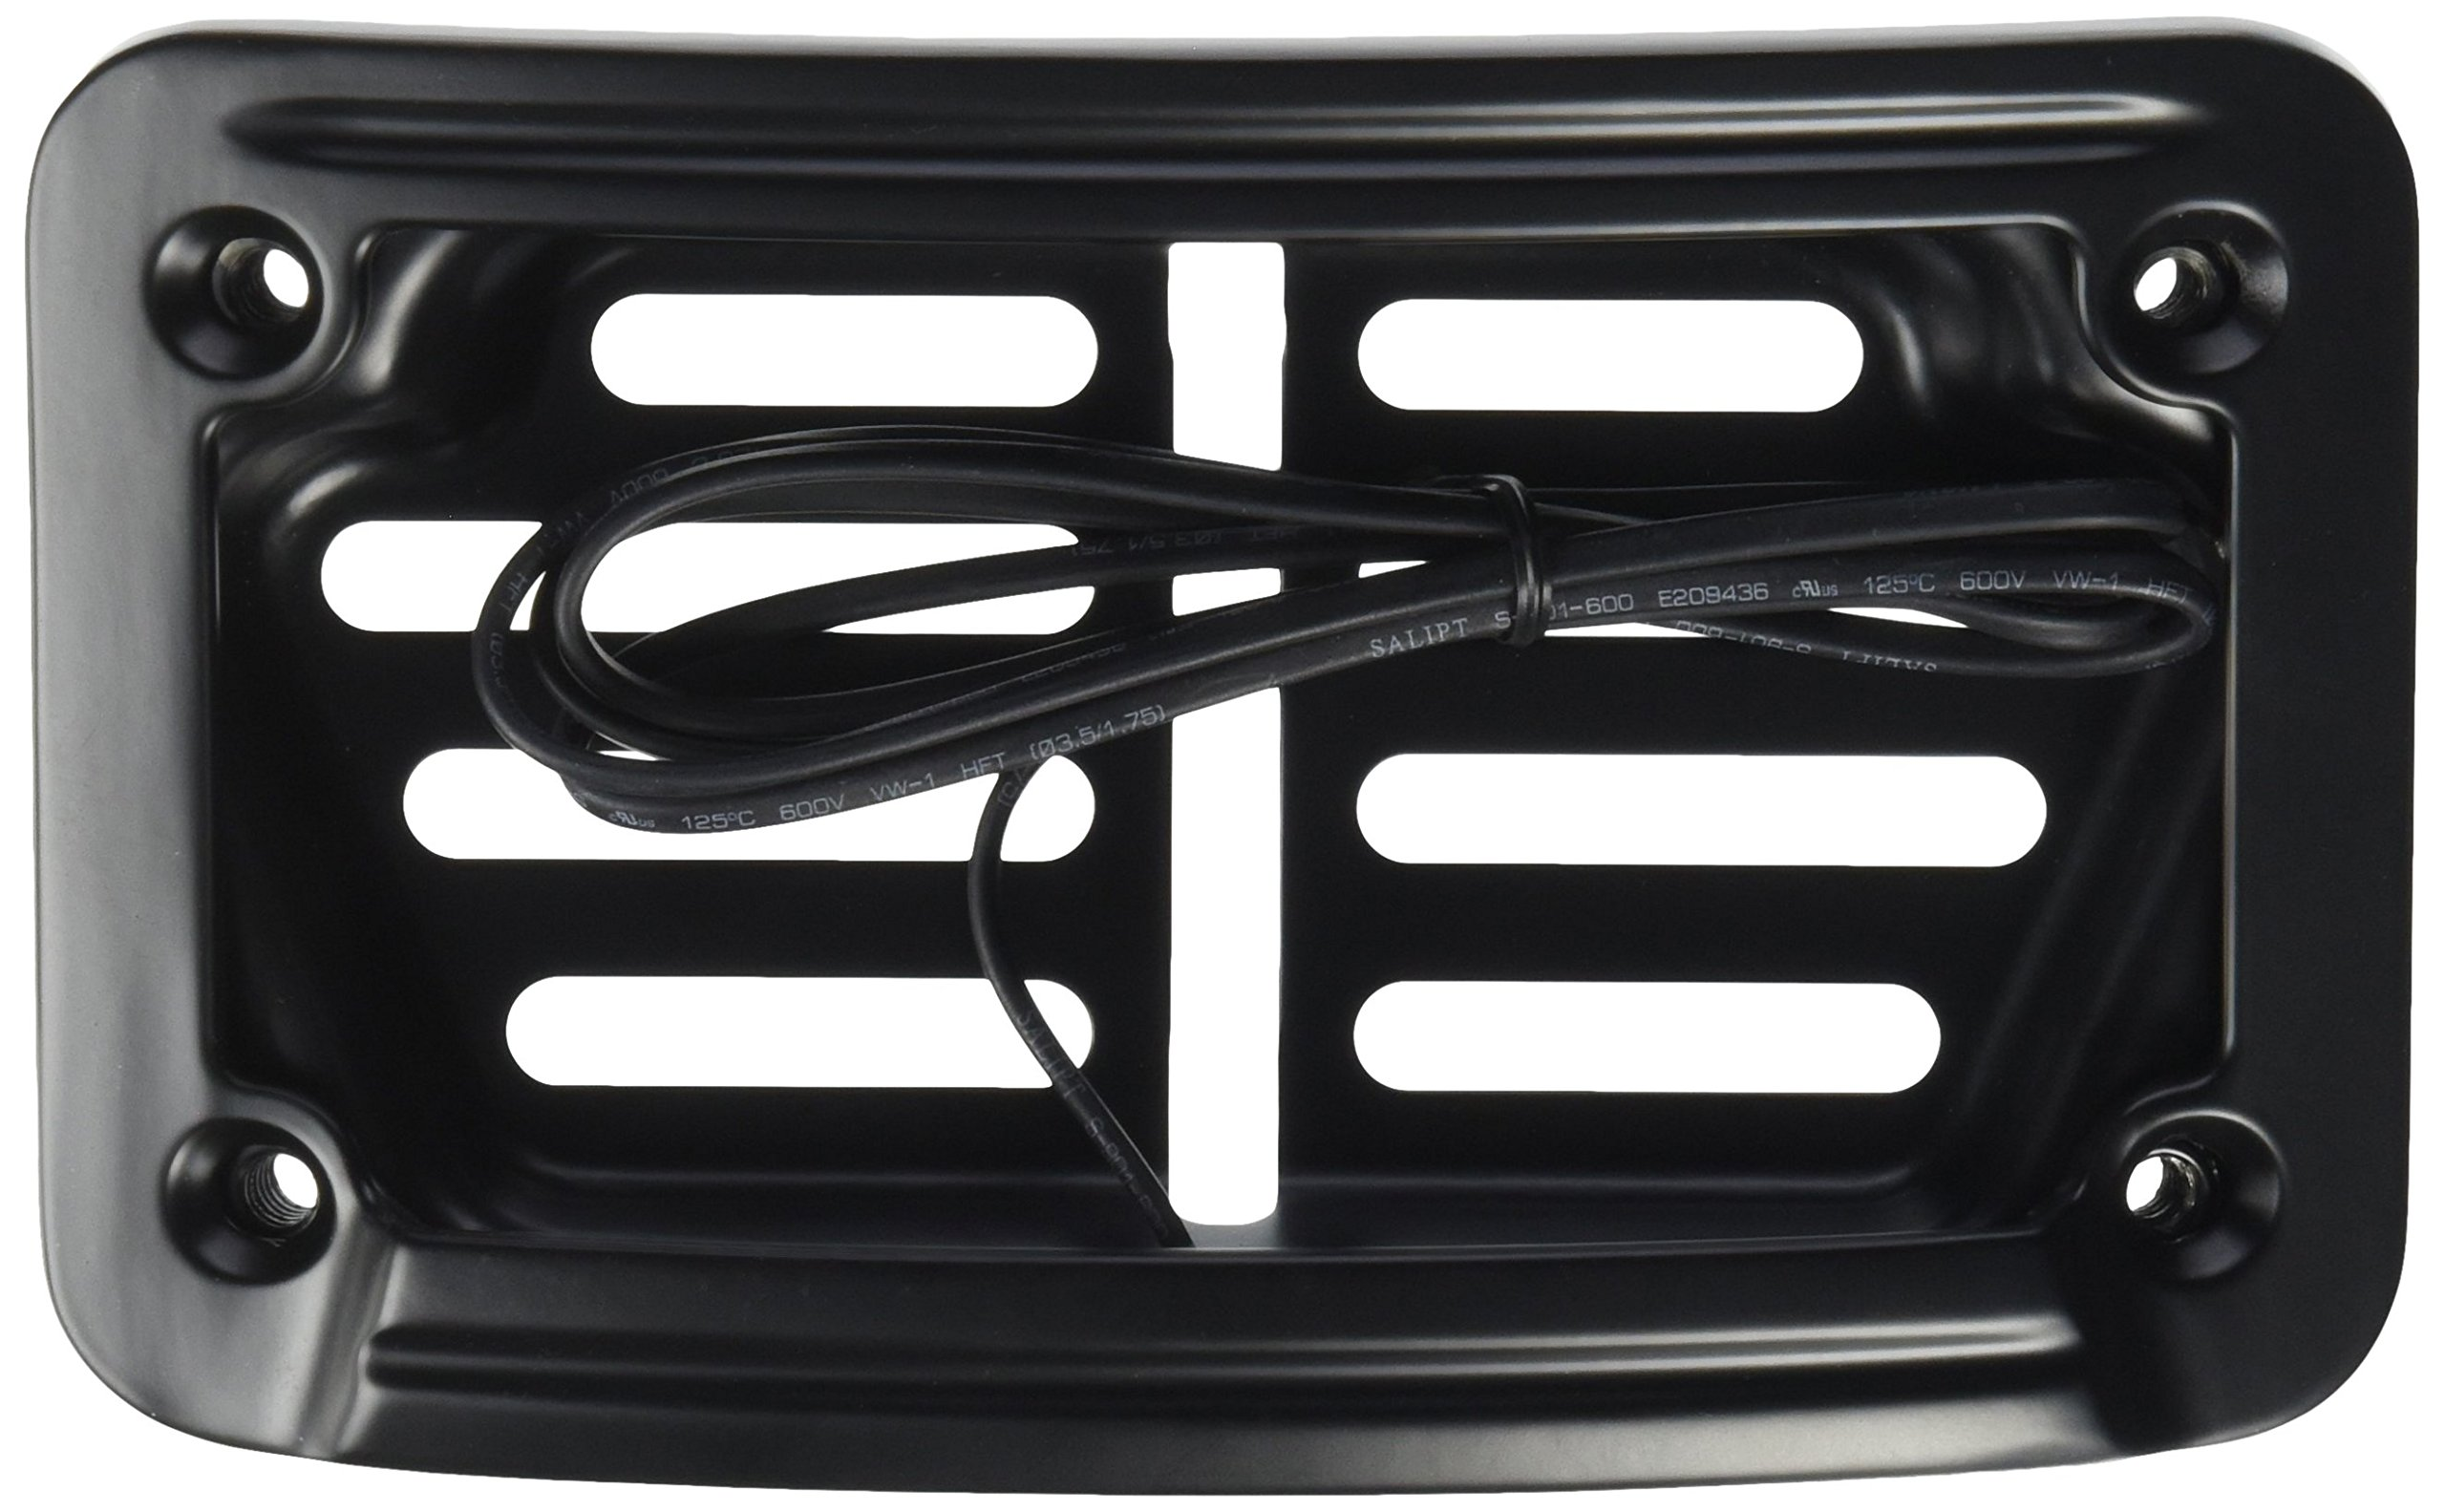 Kuryakyn 7678 Satin Black Laydown Curved LED License Plate by Kuryakyn